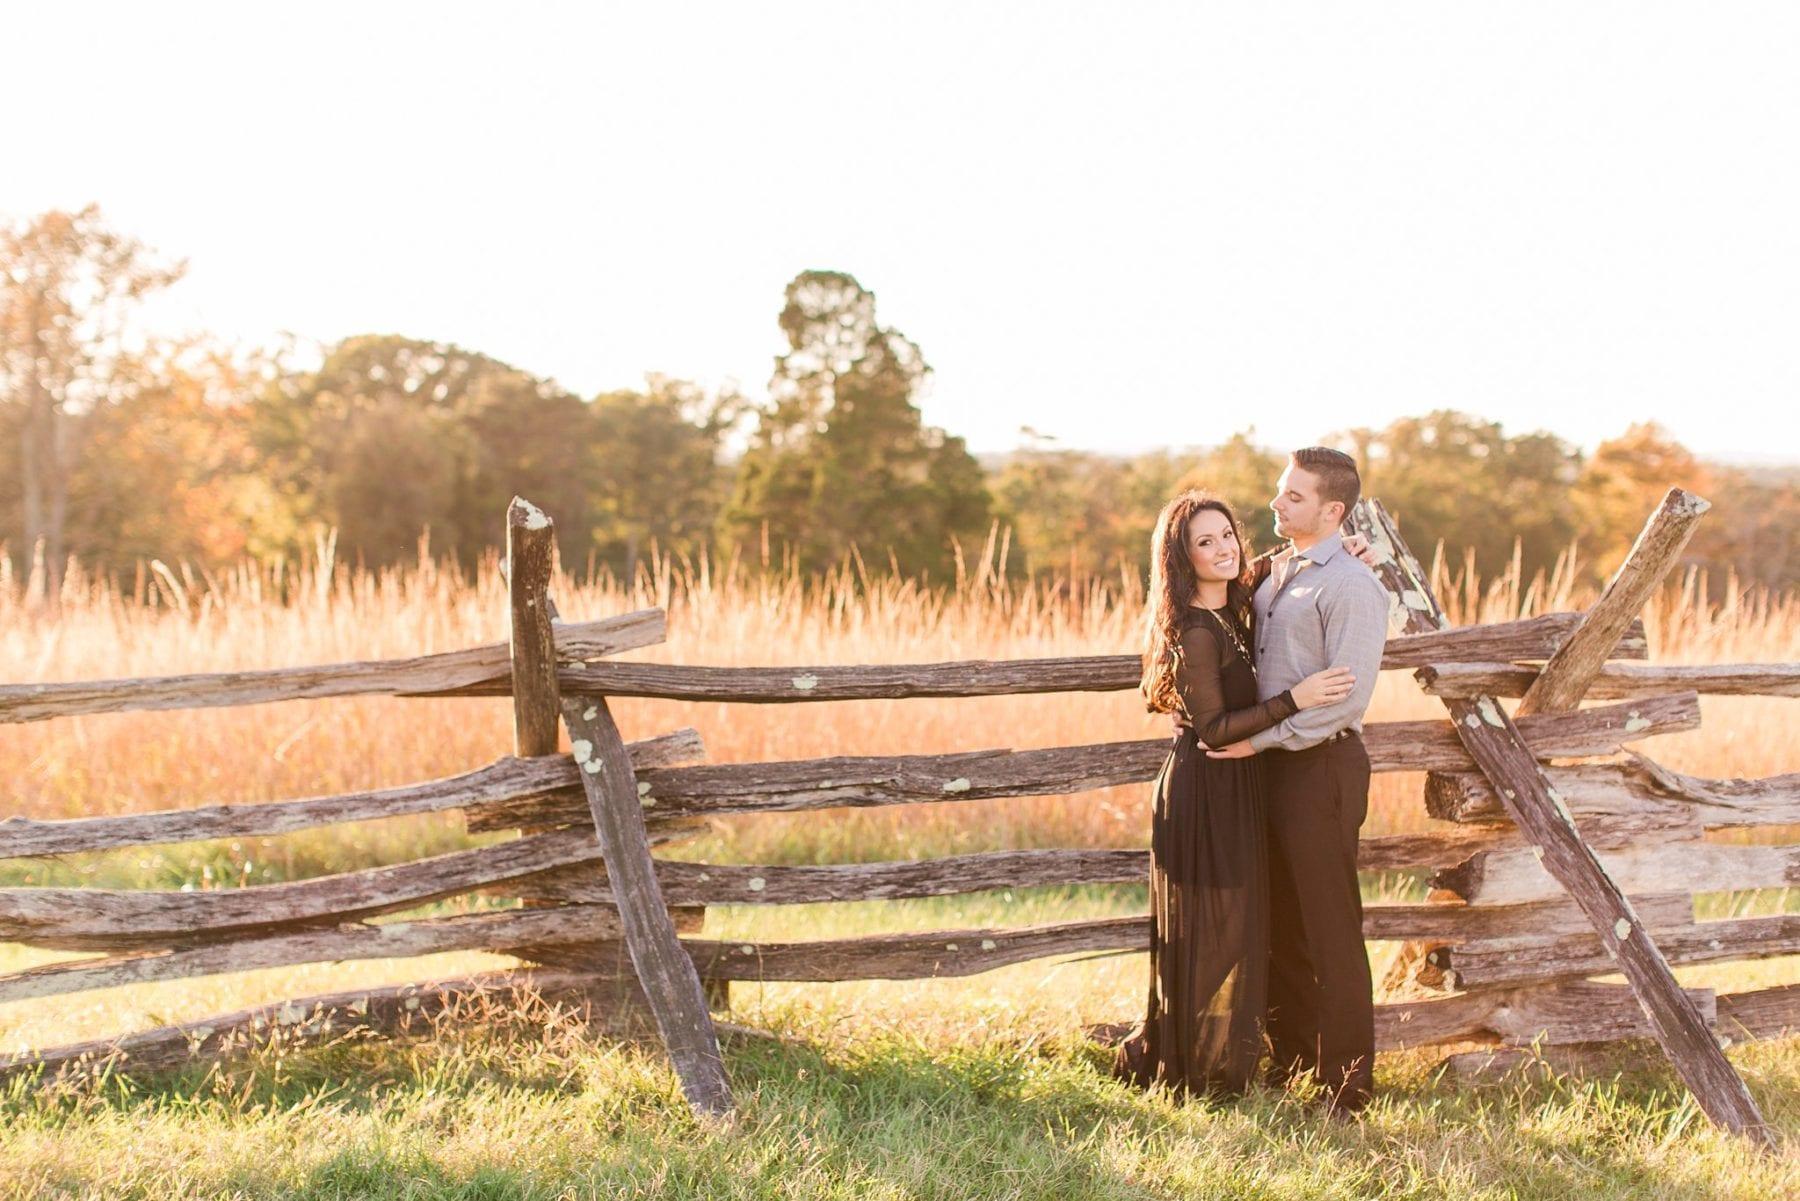 Manassas Battlefield Portraits Virginia Wedding Photographer Megan Kelsey Photography Lianne & Chris-124.jpg